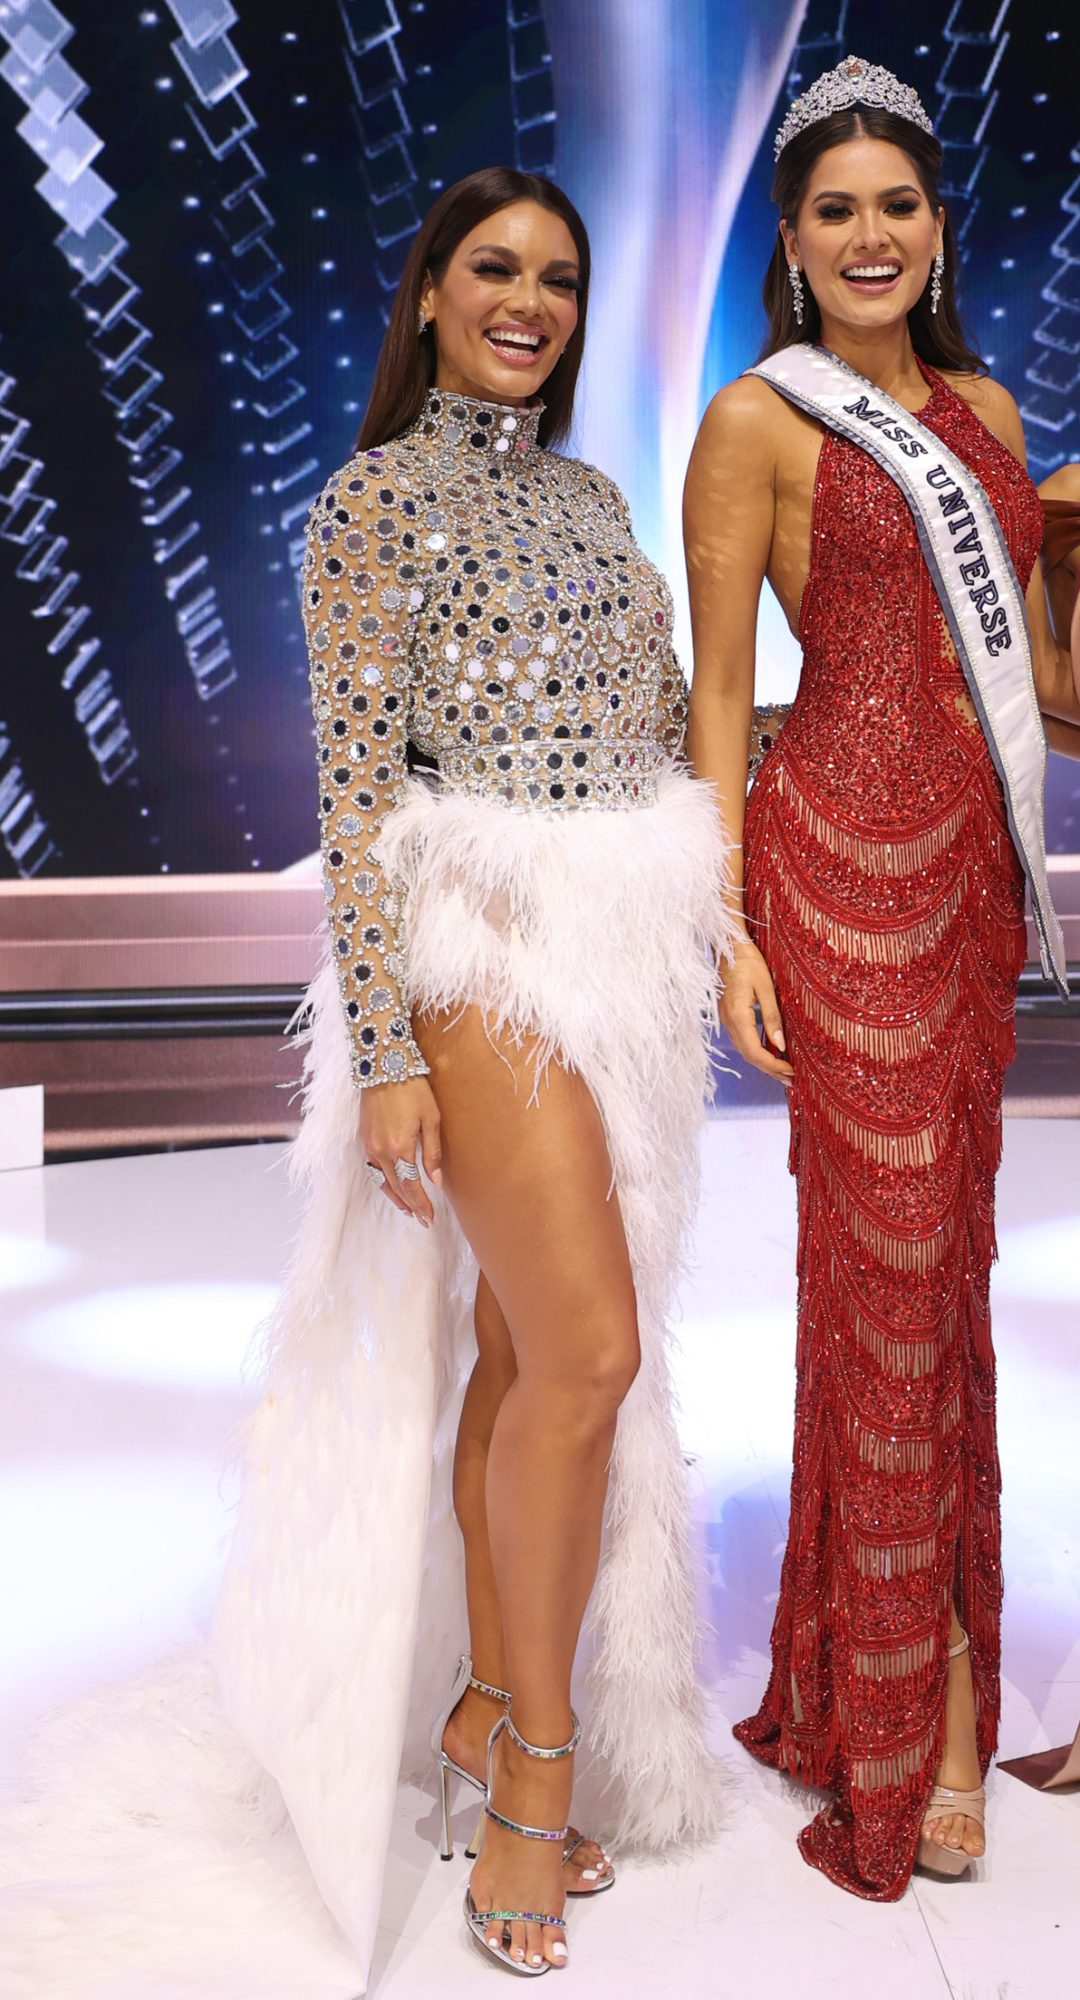 Miss Universo presentadoras, Zuleyka Rivera, Miss Mexico, Miss Universo